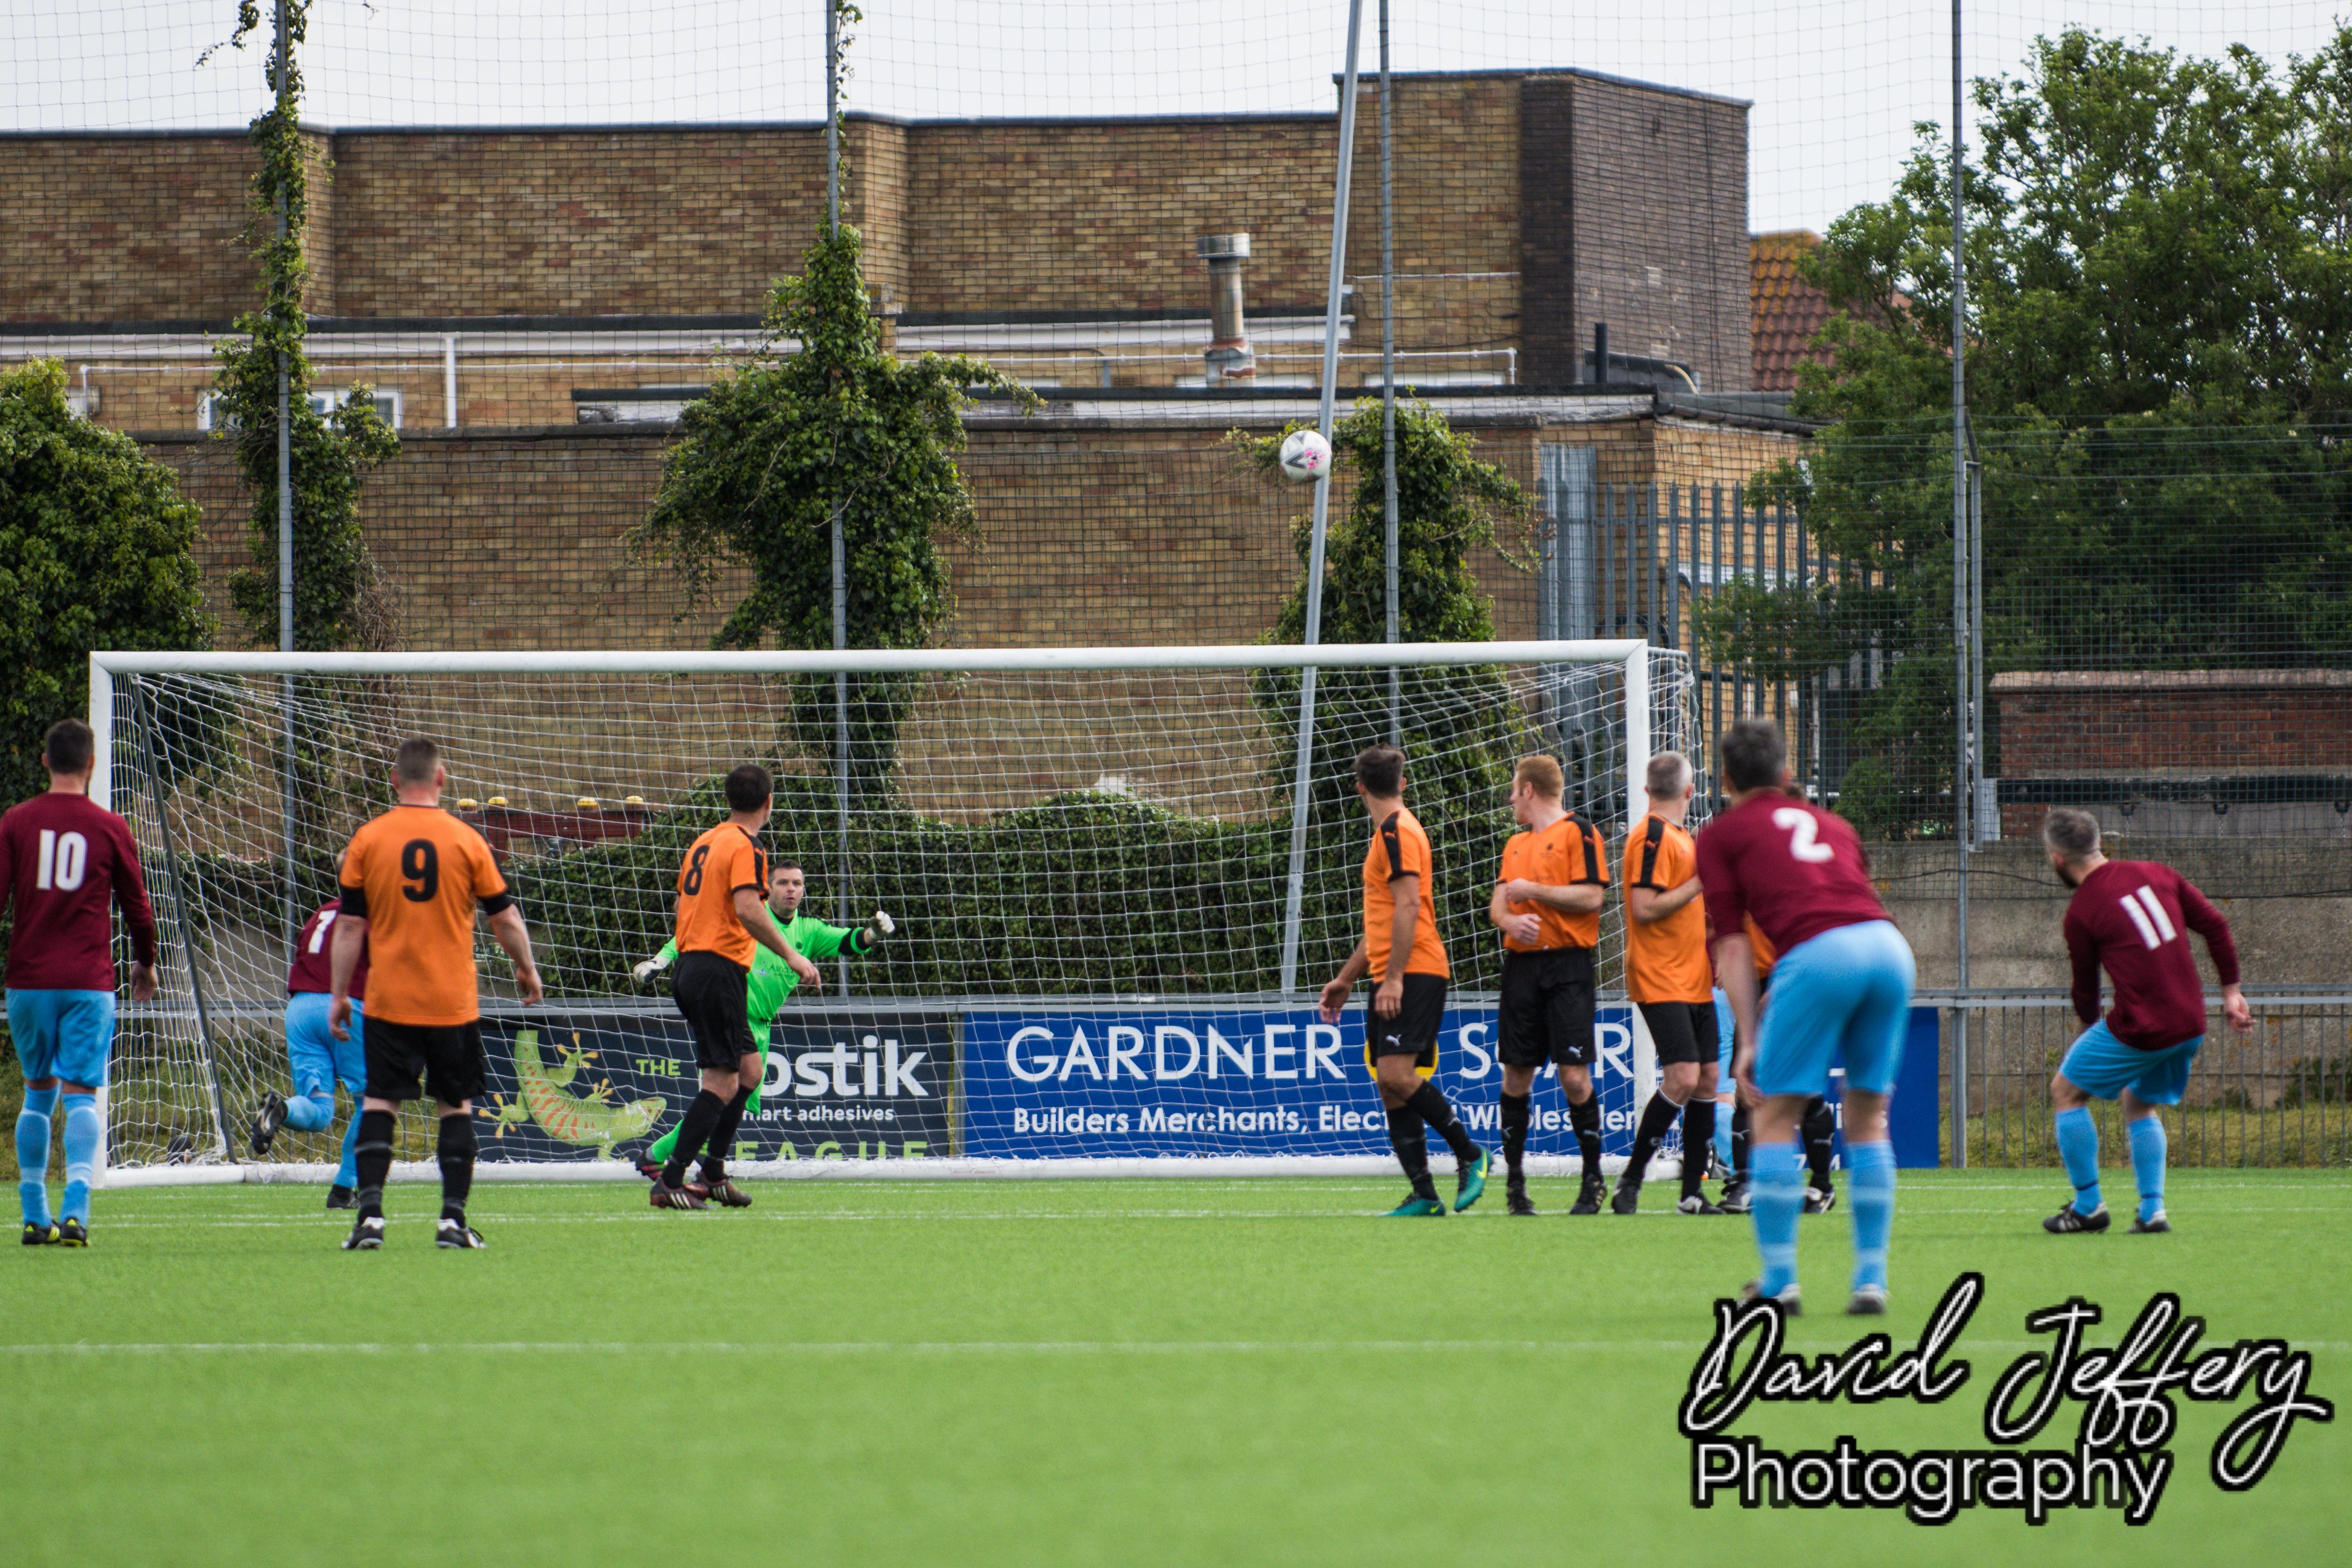 028 MOFC Vets vs Horl Vets 05.05